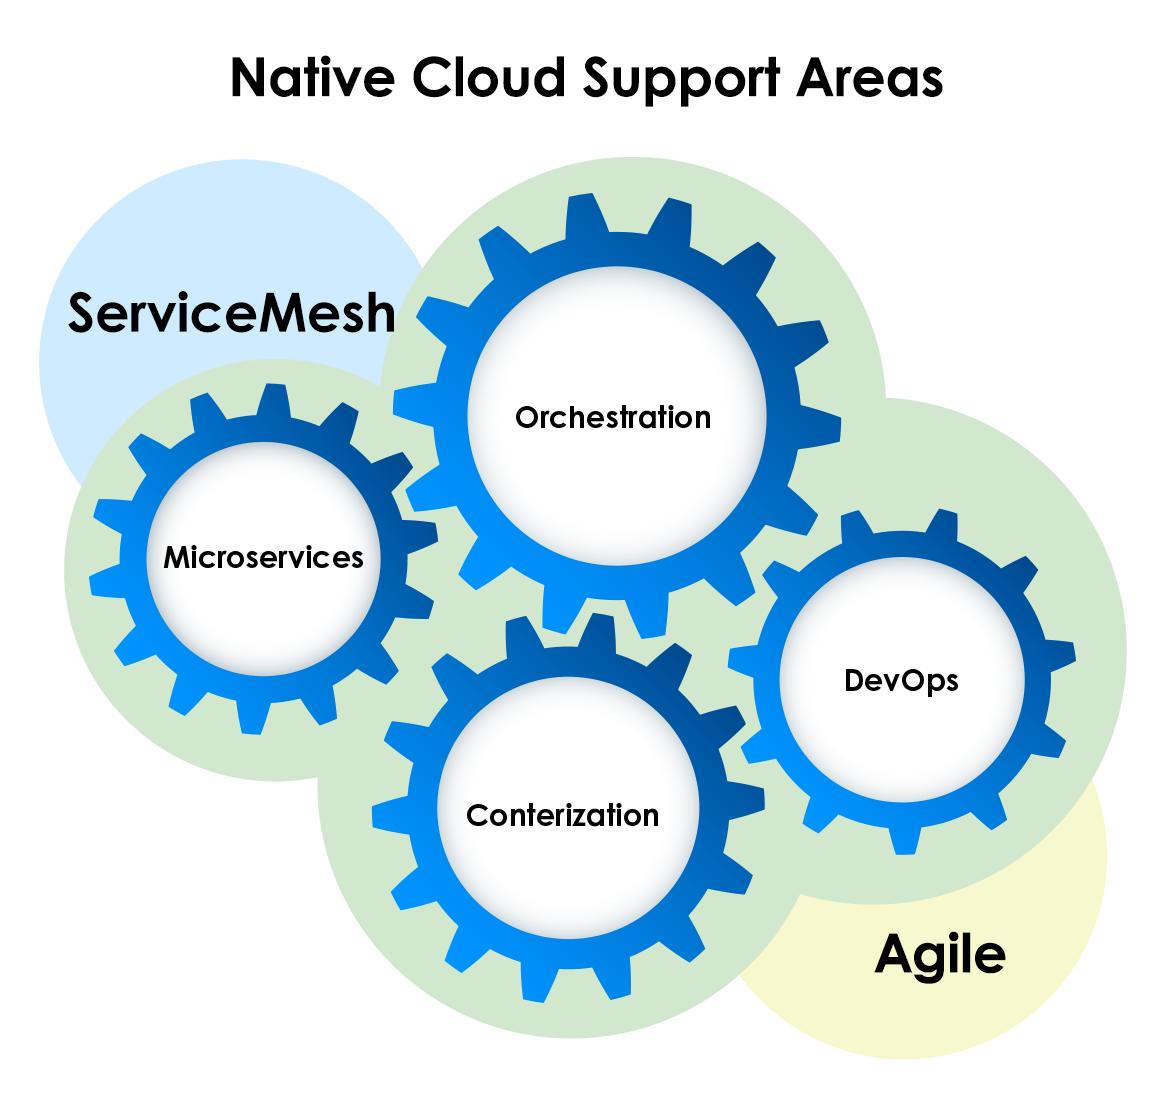 Native Cloud Support Areas: Contenerization, Microservices, Orchestration, DevOps + ServiceMesh, Agile